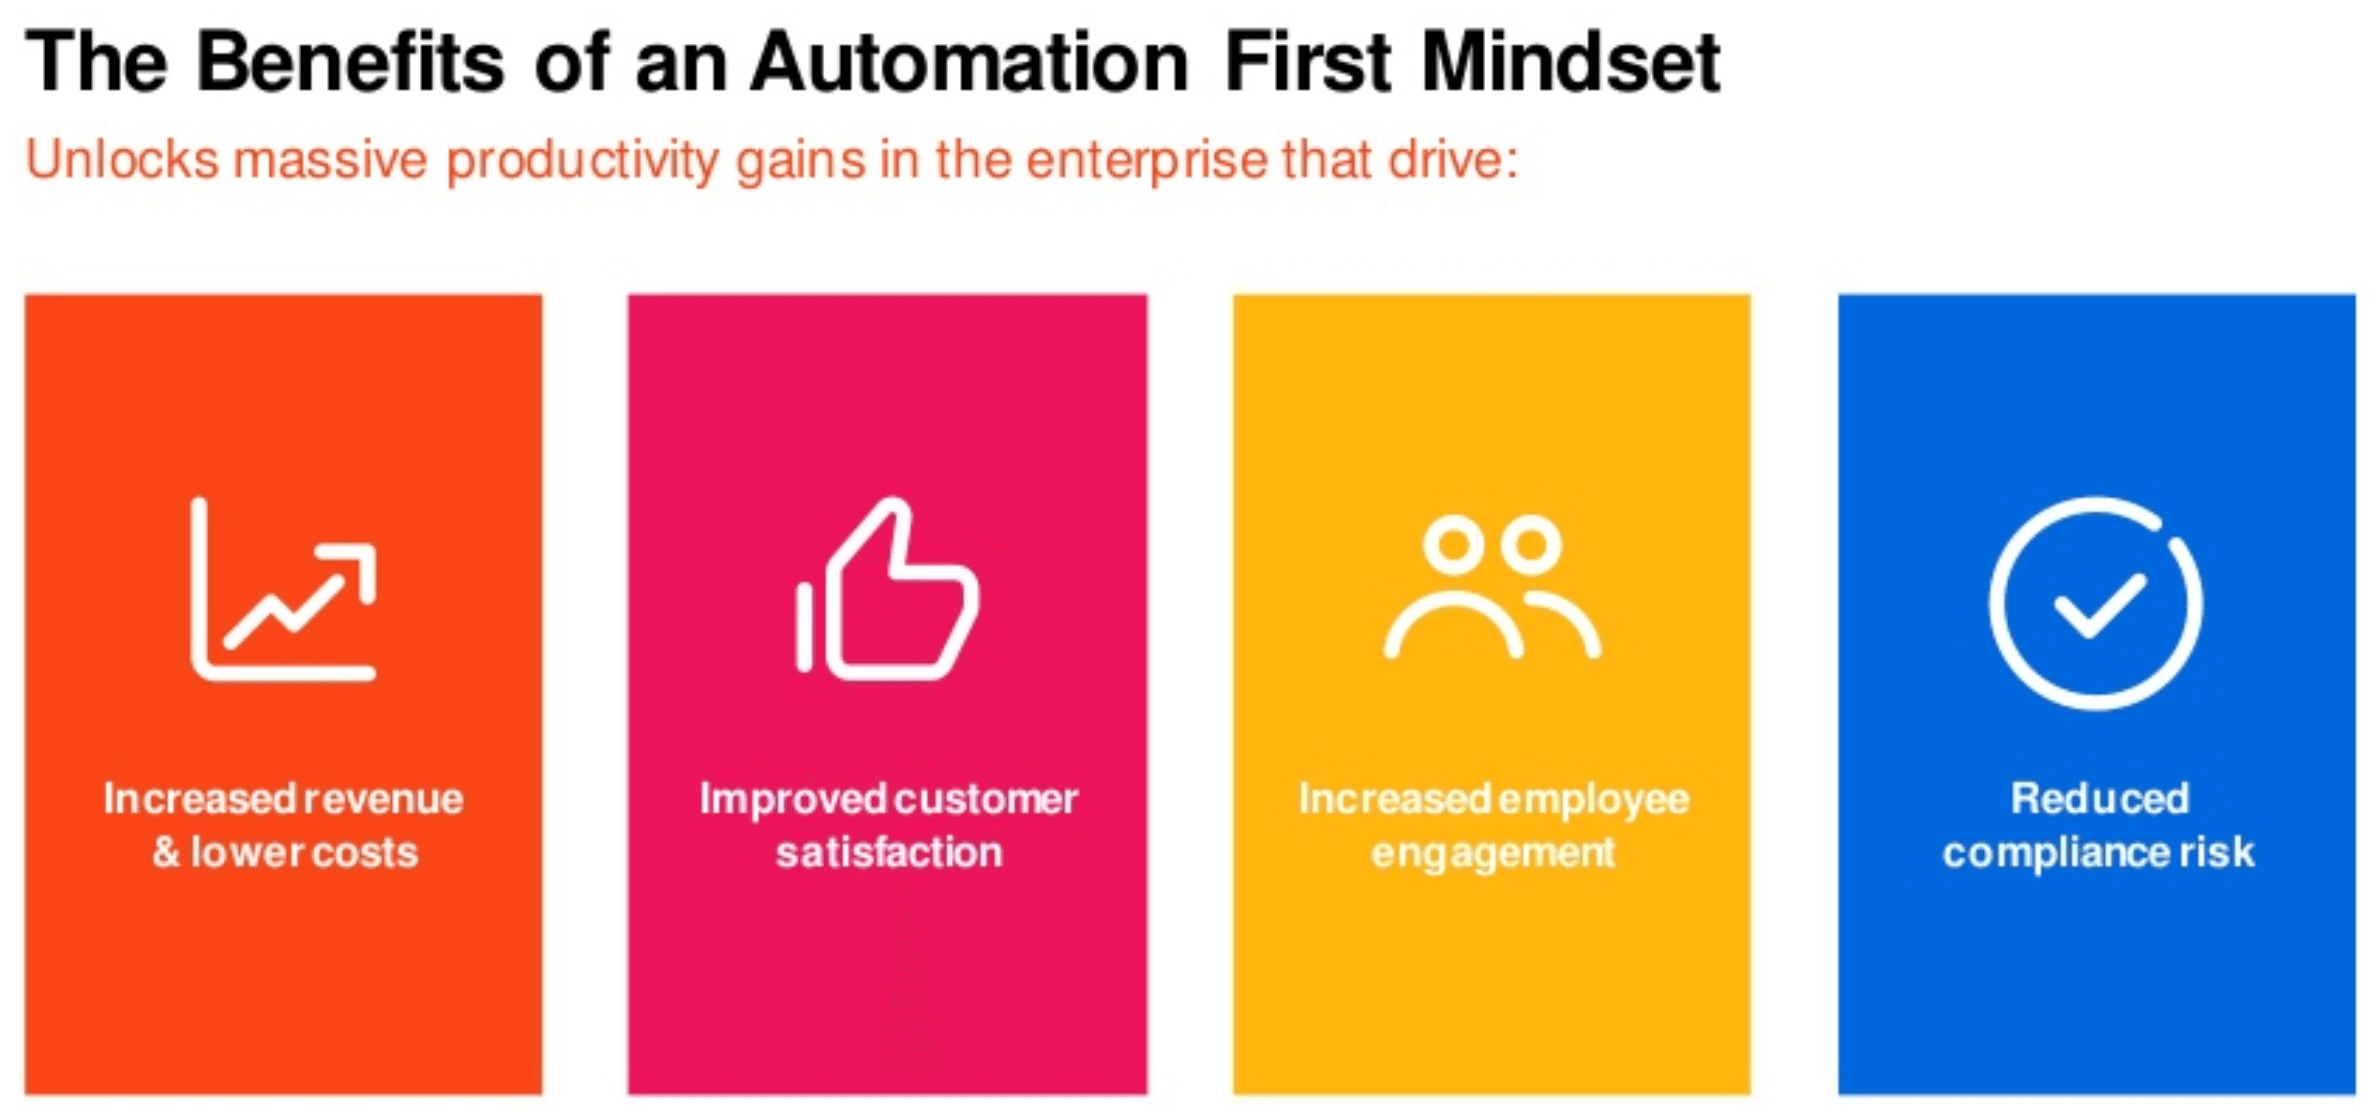 automation first mindset benefits